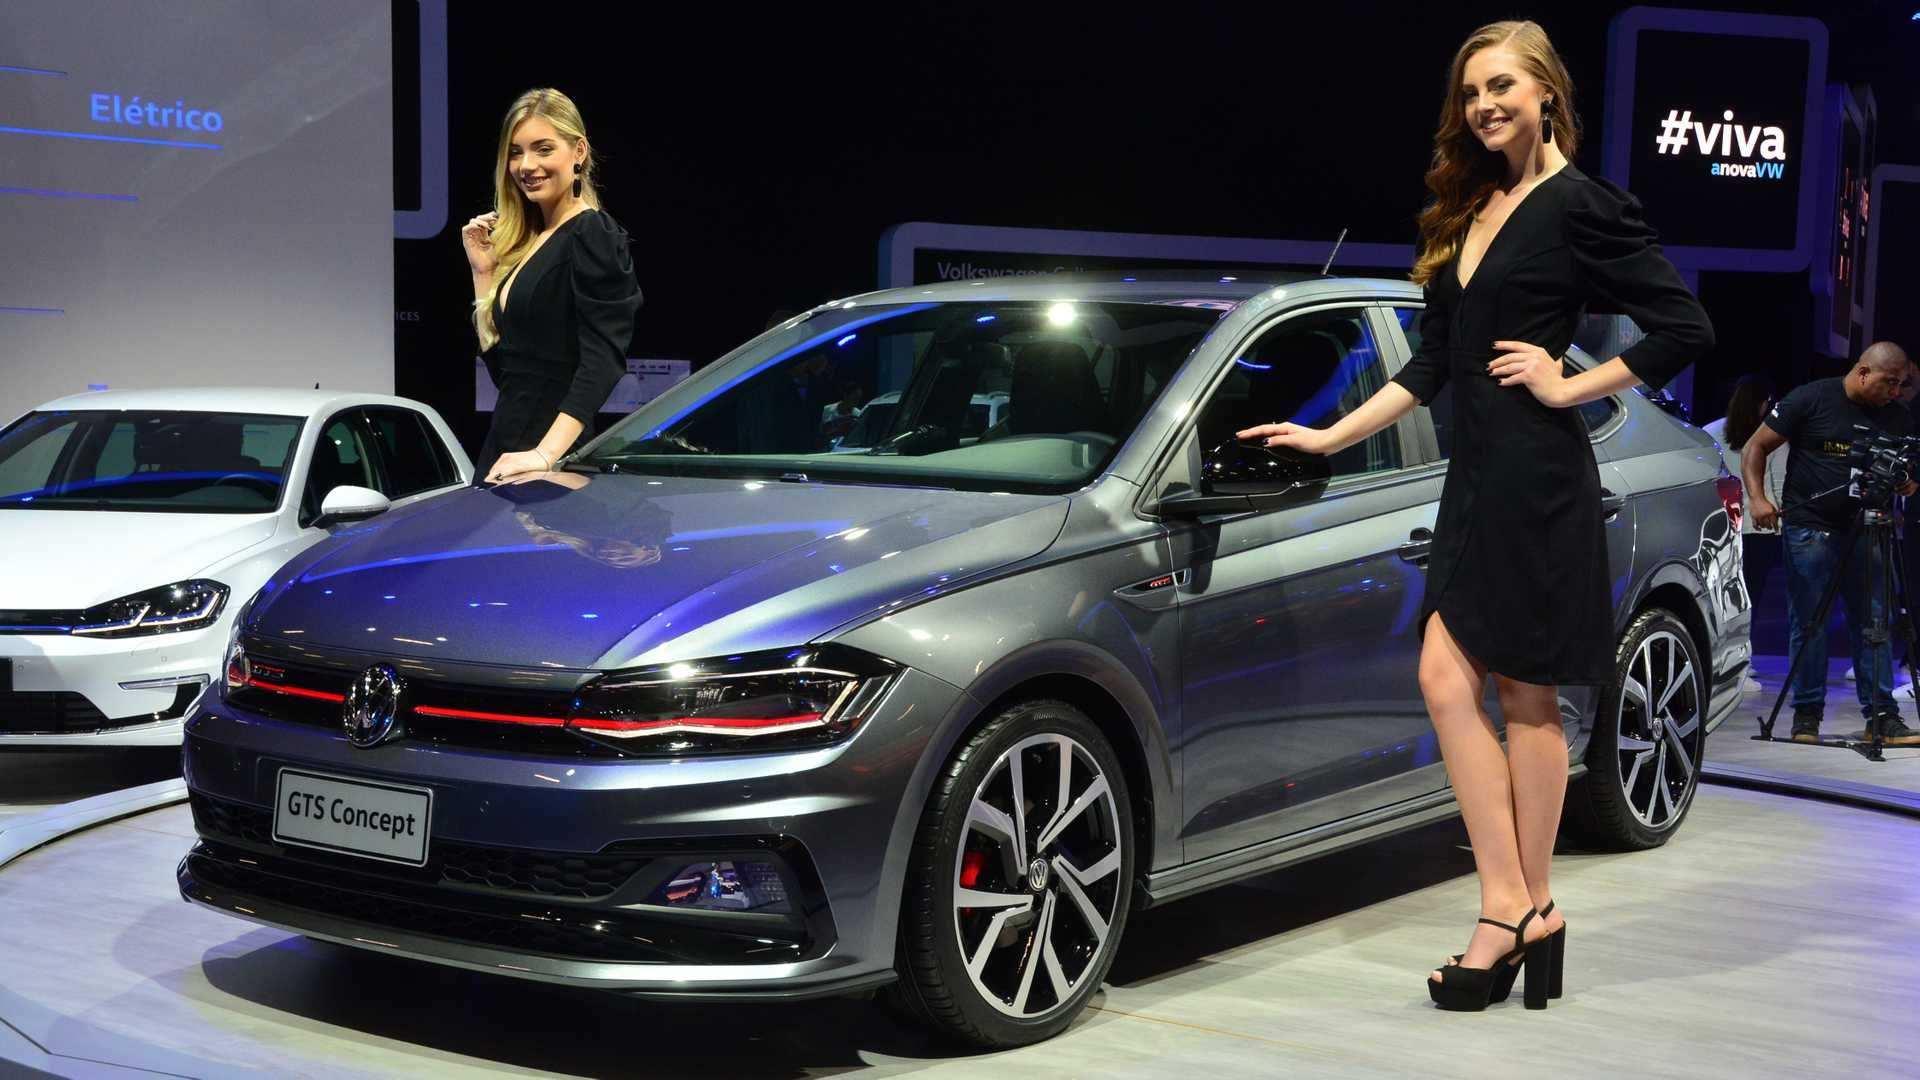 36 Gallery of Volkswagen Virtus 2020 Specs and Review for Volkswagen Virtus 2020